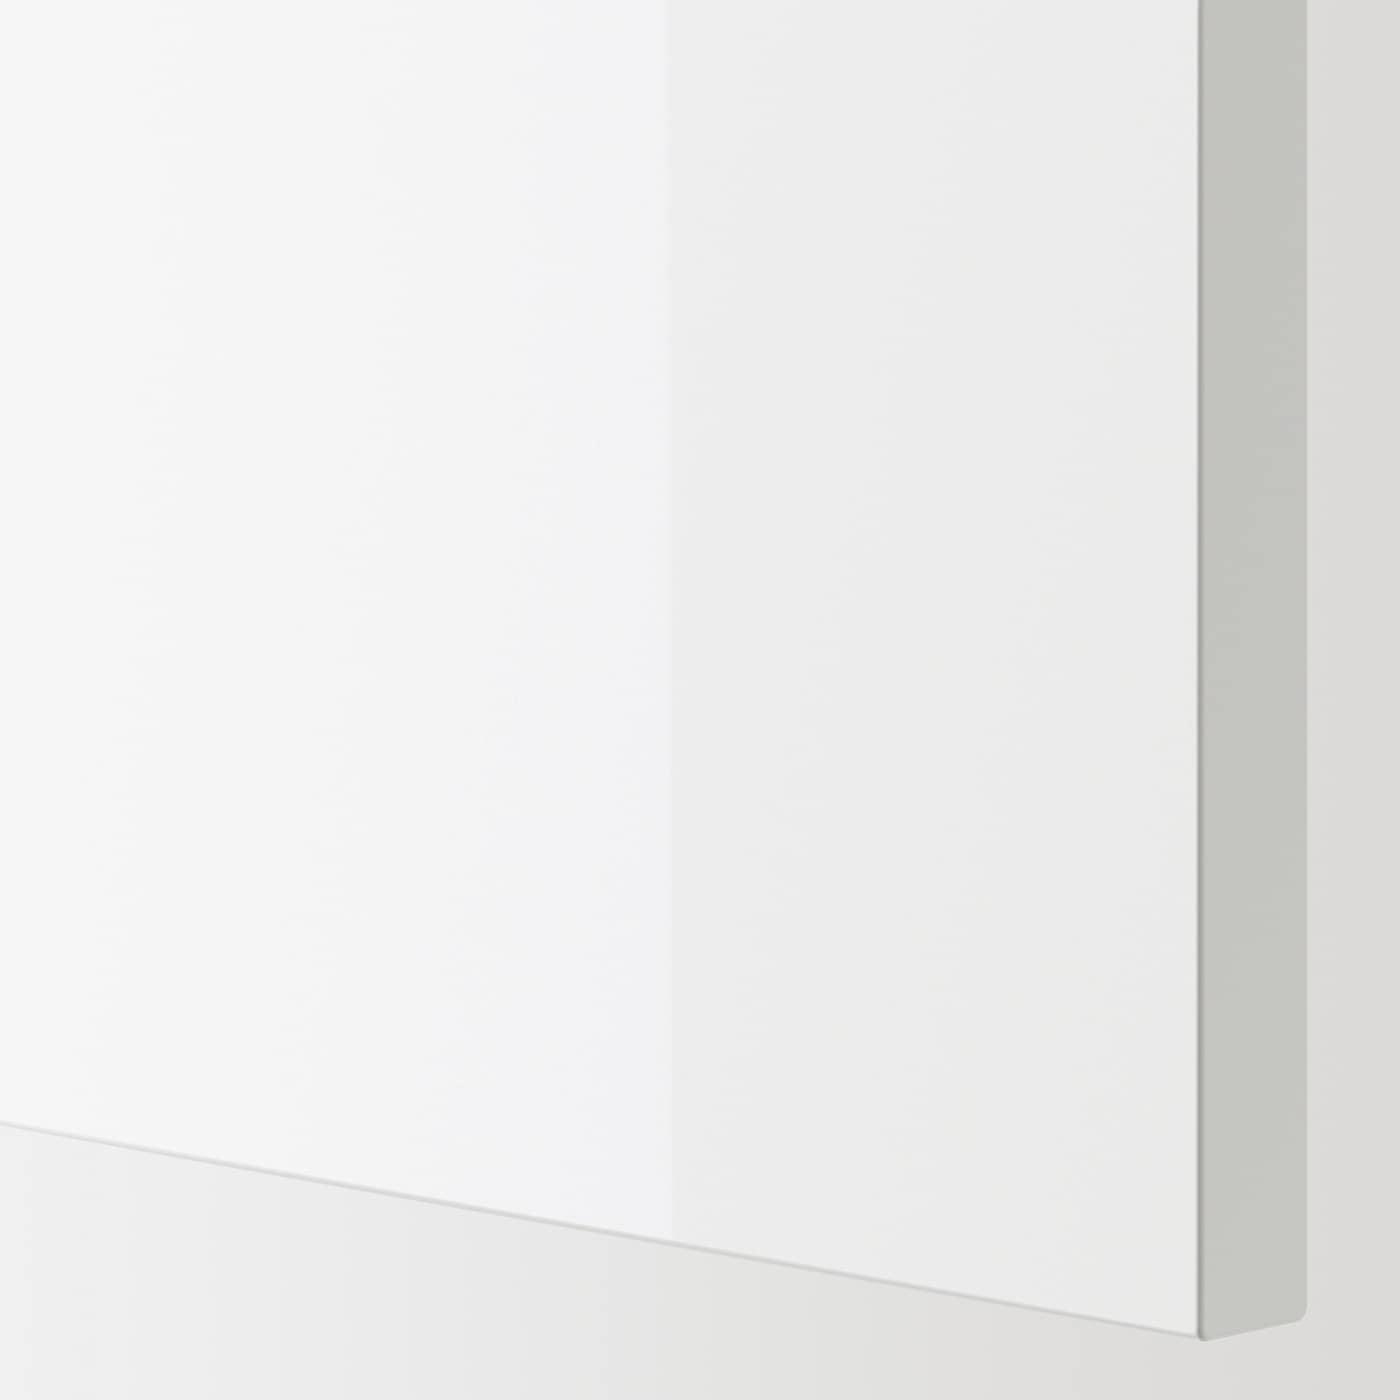 ENHET Wall cb w 2 shlvs/doors, grey/high-gloss white, 40x15x75 cm